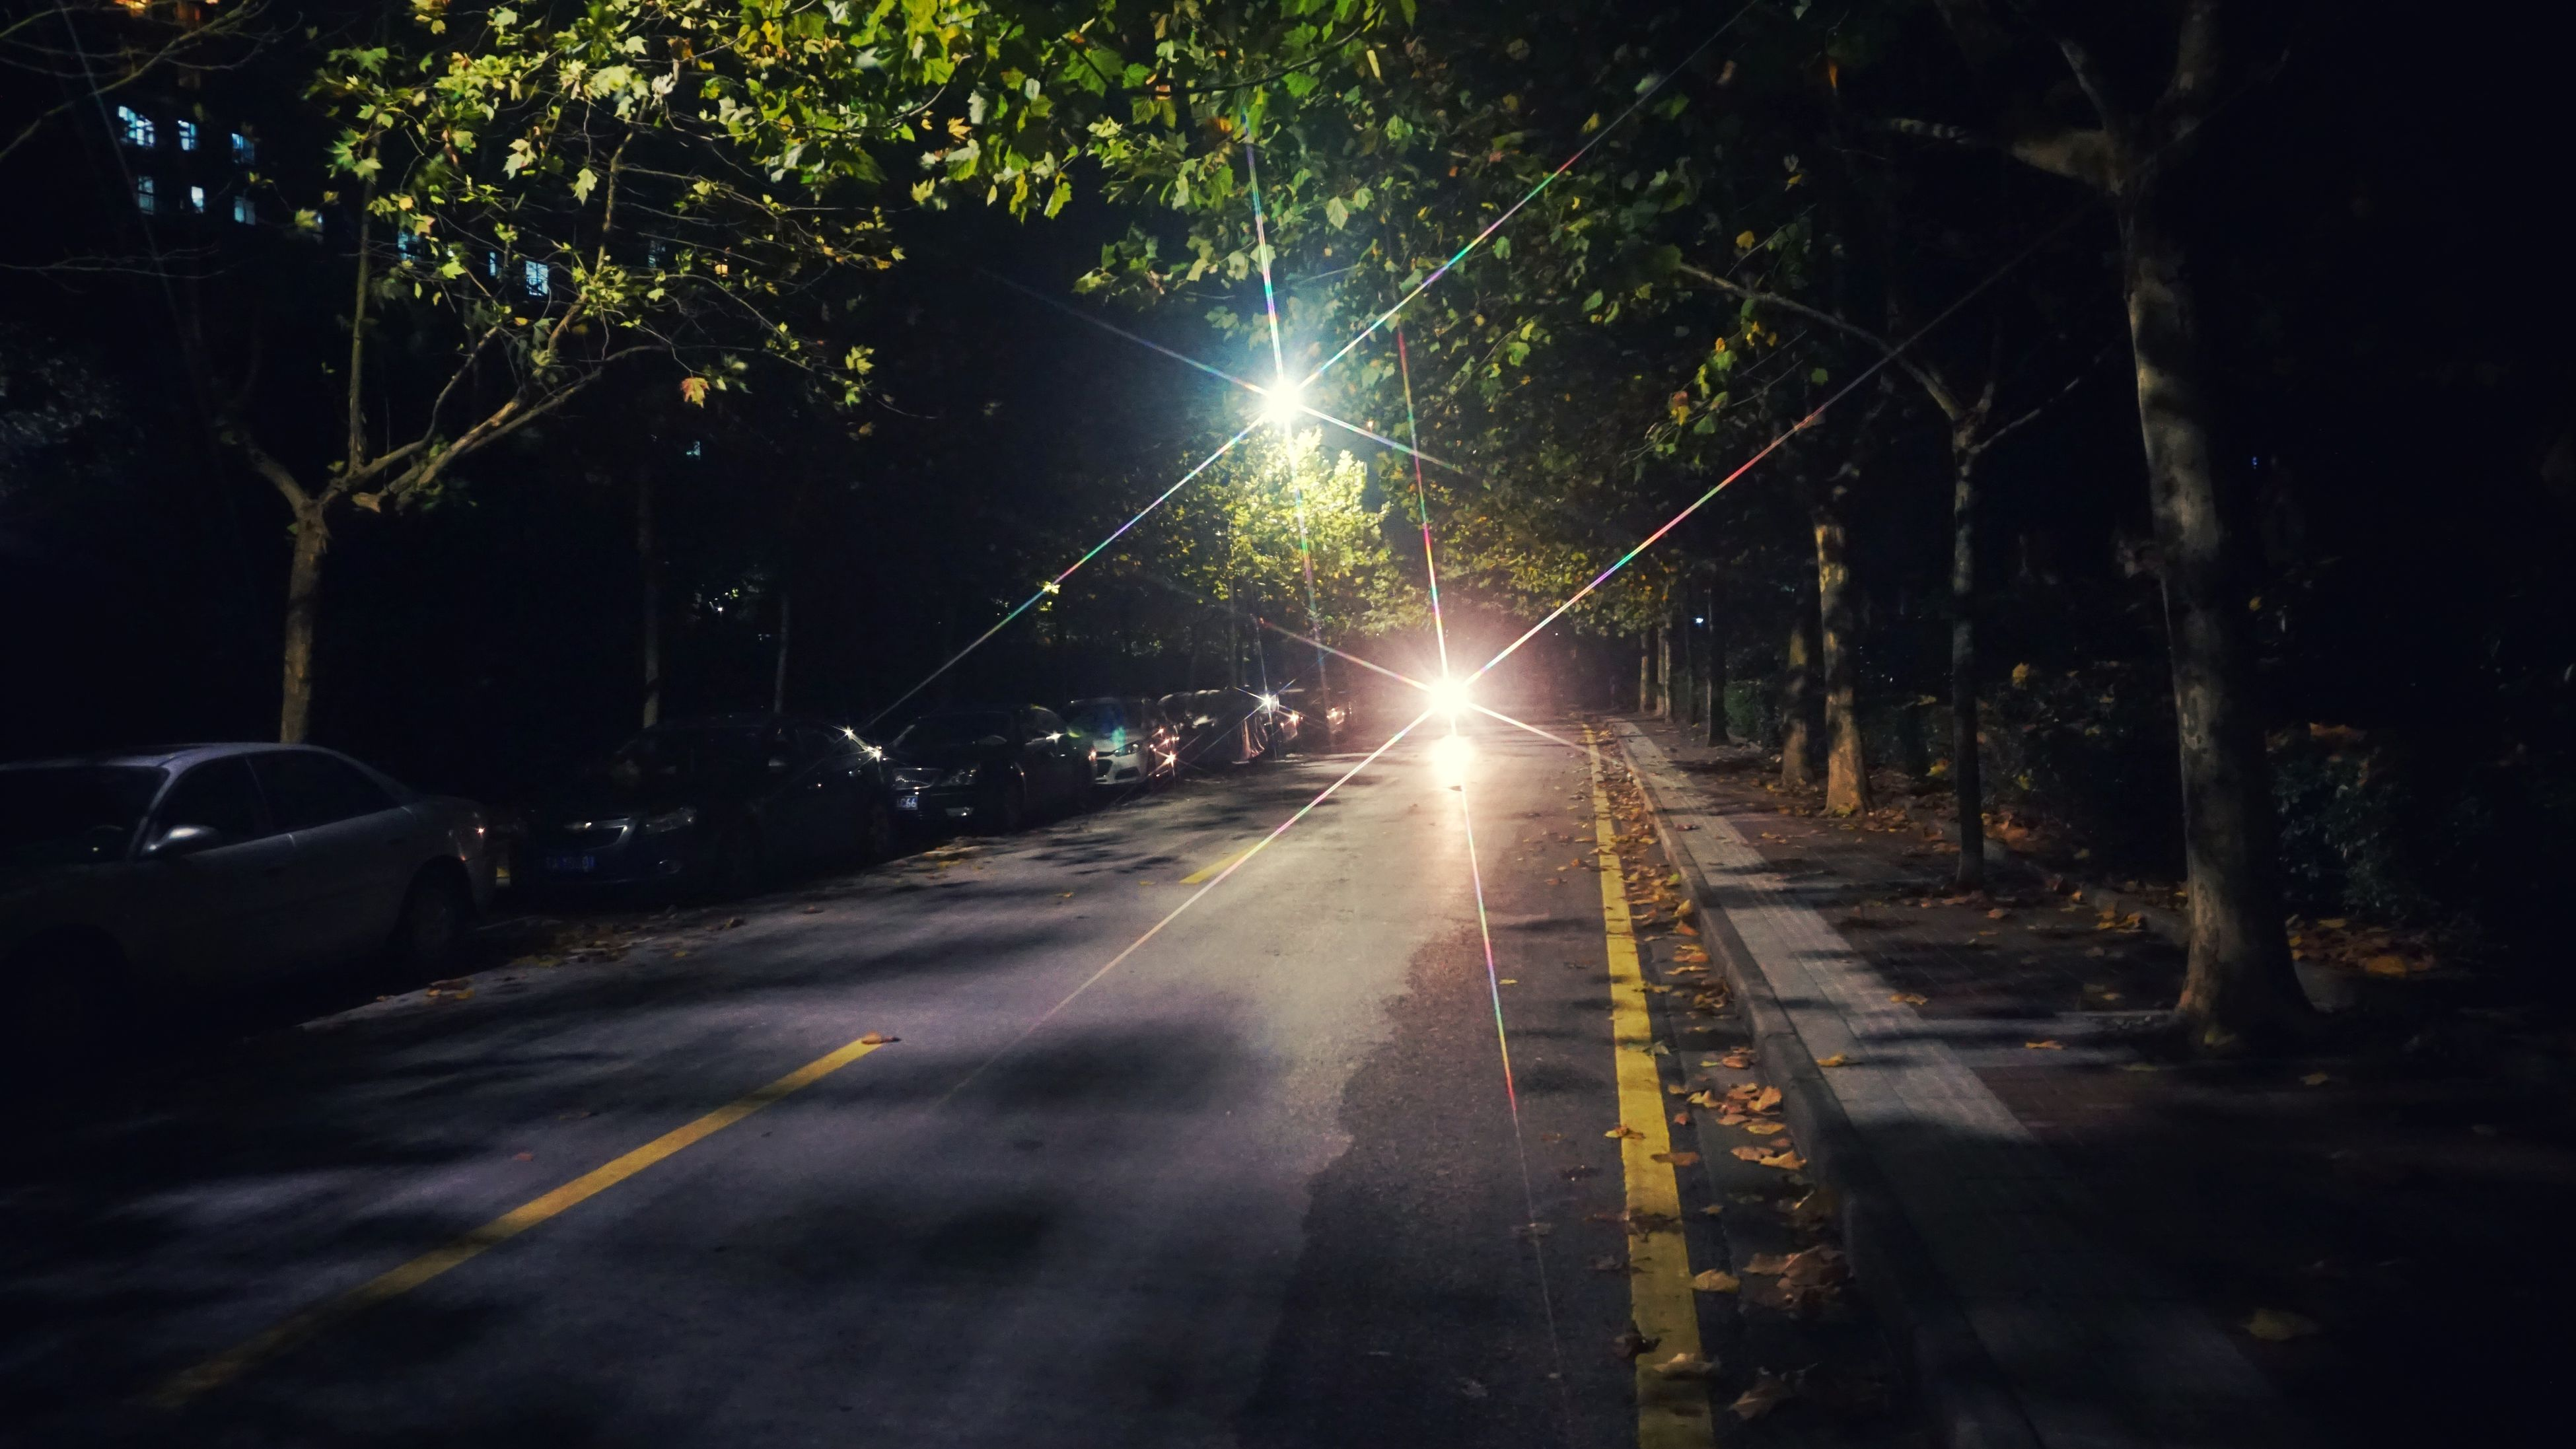 illuminated, night, street, tree, street light, road, no people, city, transportation, the way forward, outdoors, nature